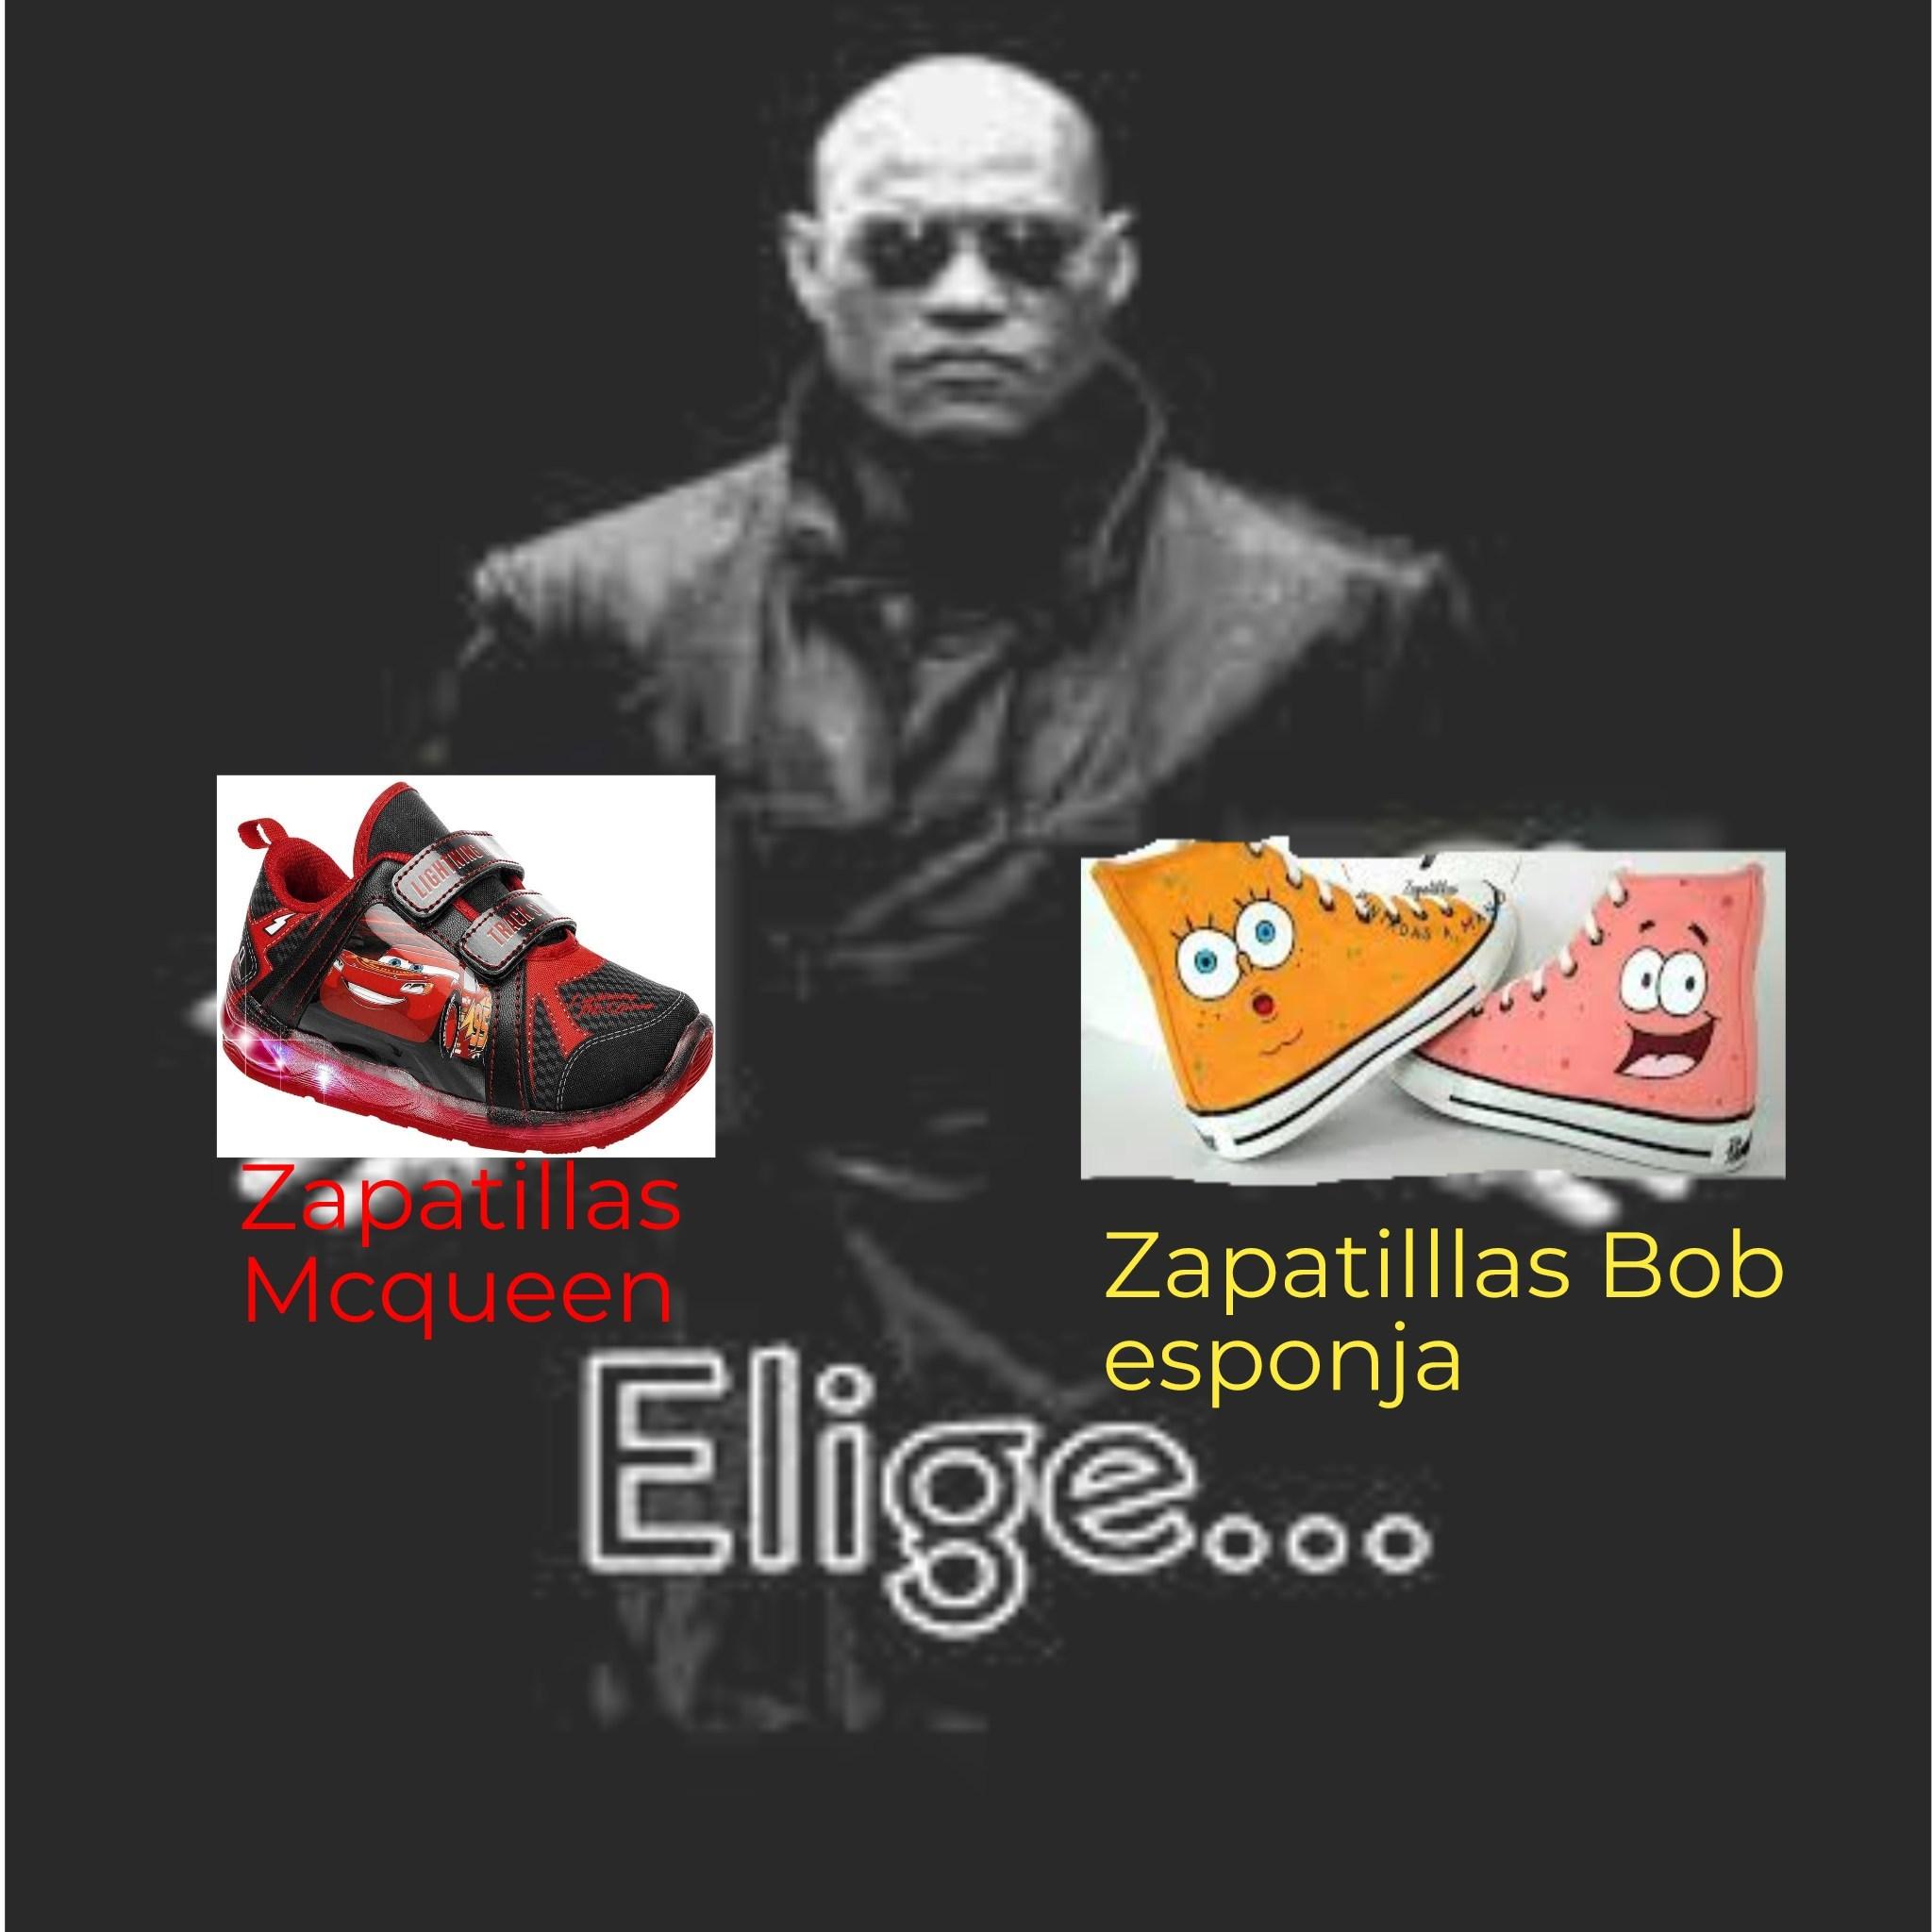 Elije pibe - meme